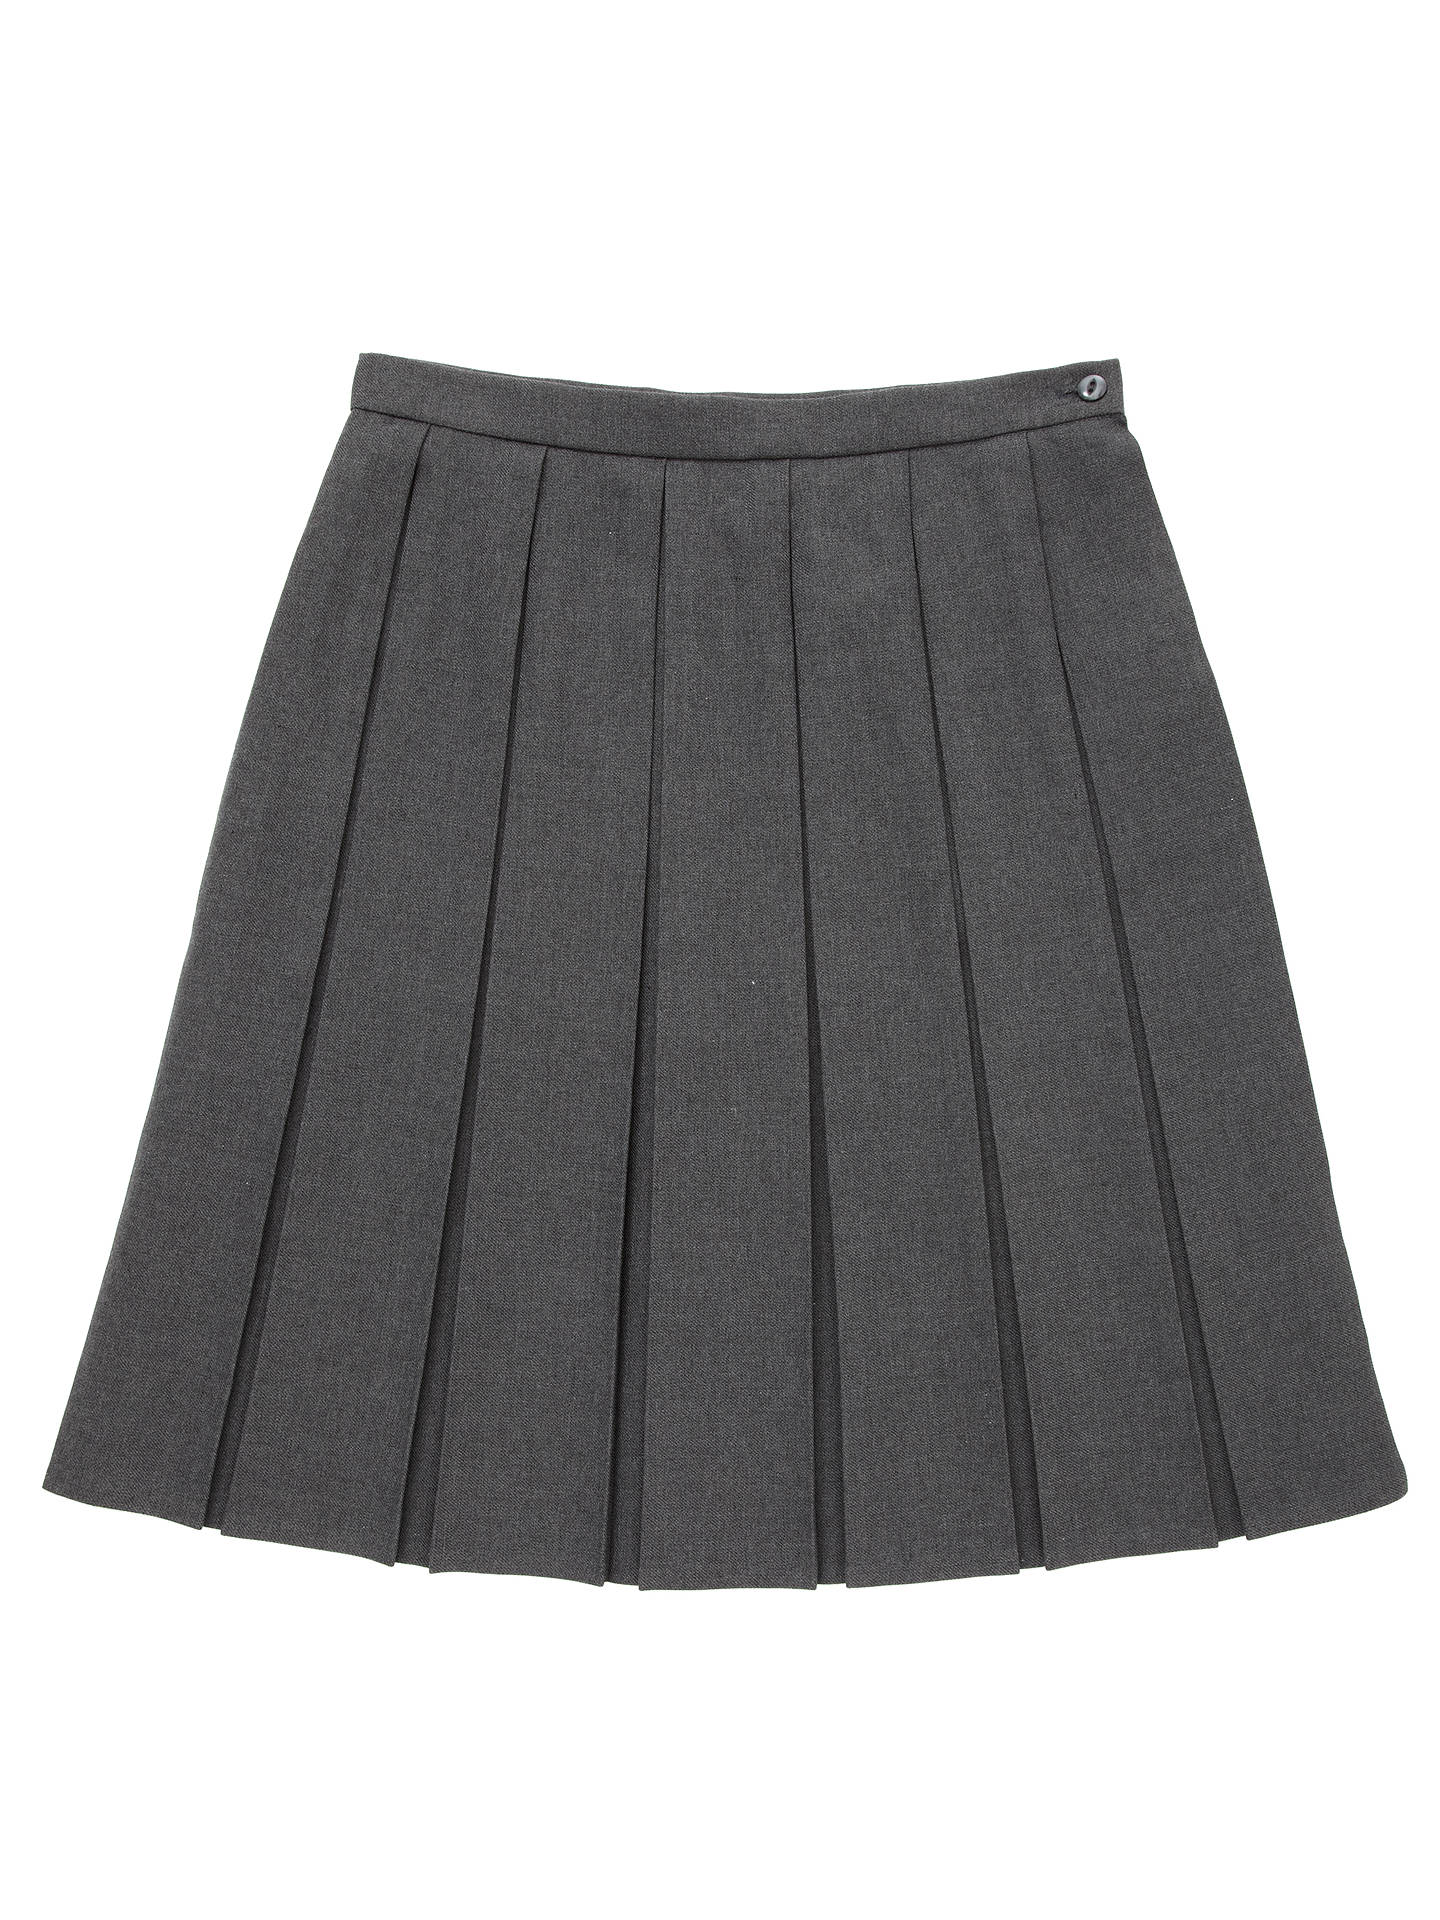 School Uniform Girls /& Ladies Office Workwear Plain Skirts Grey